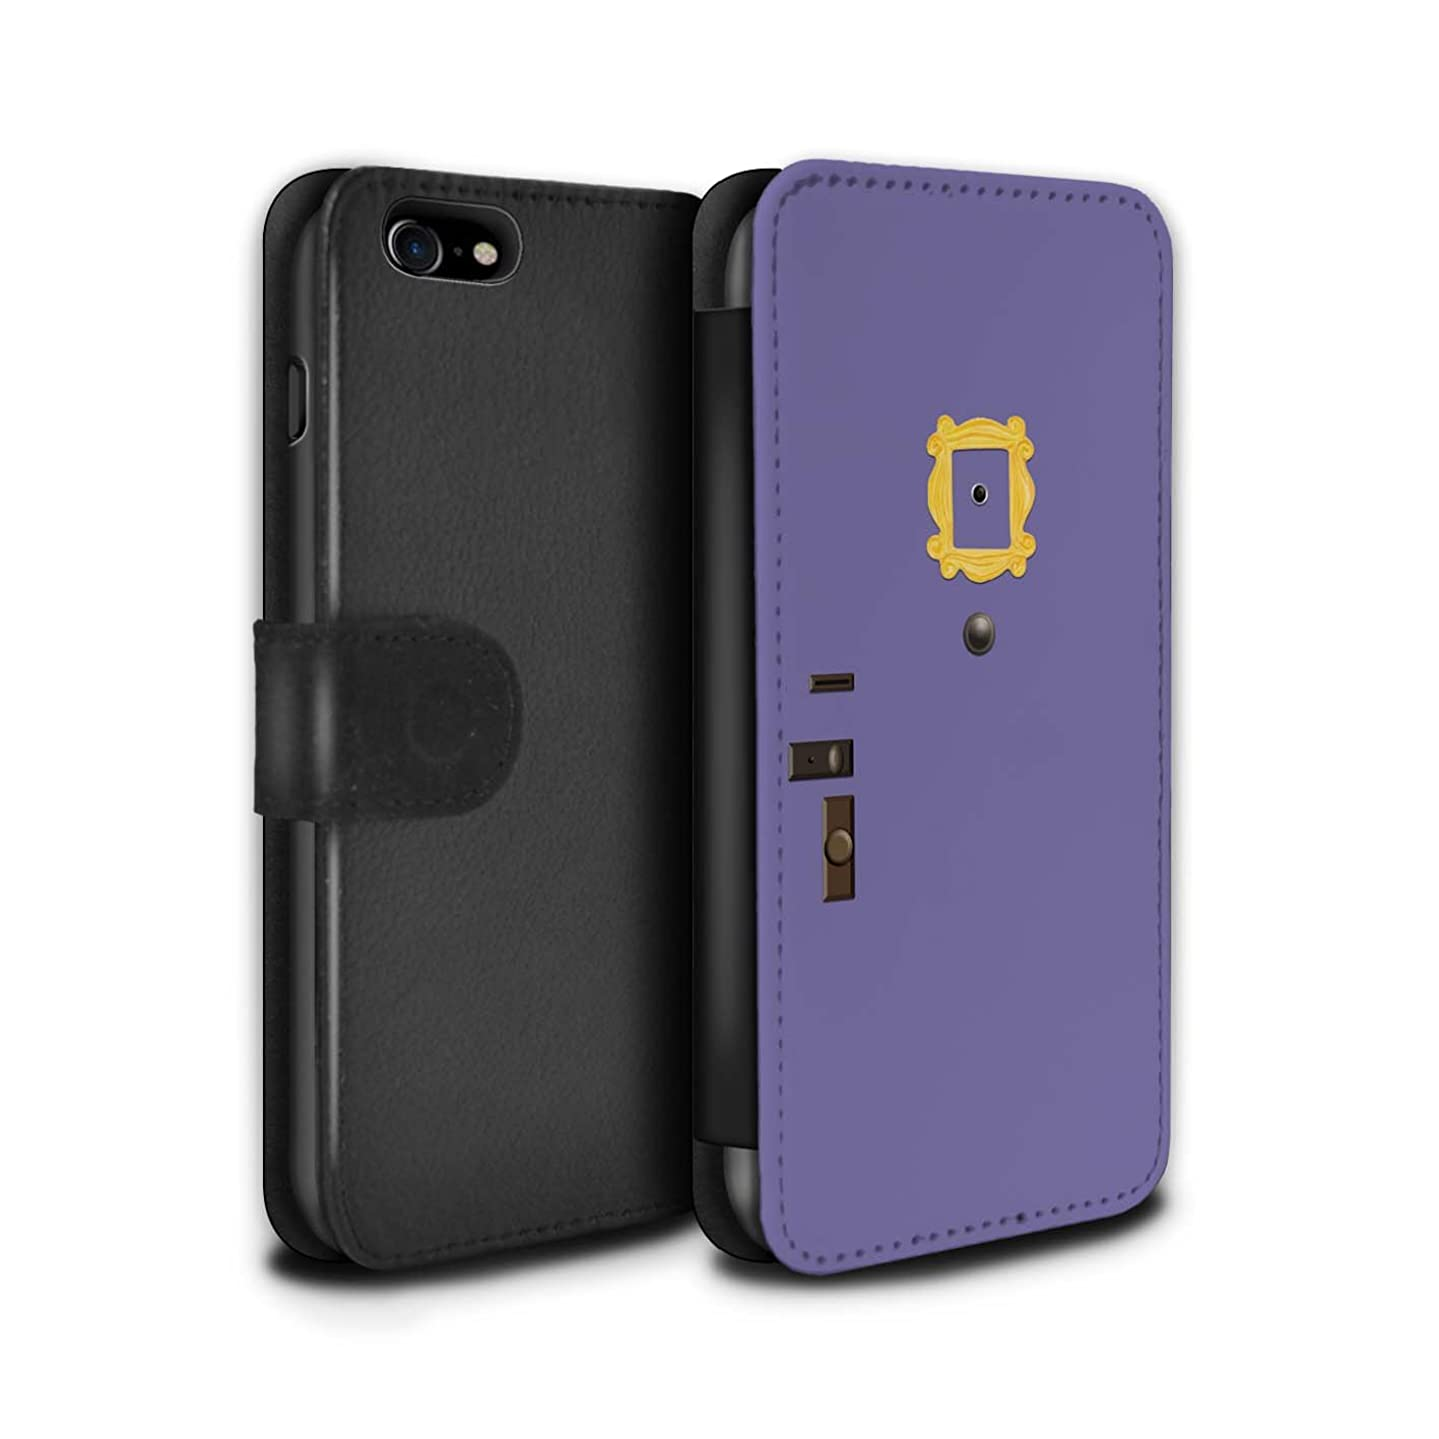 STUFF4 PU Leather Wallet Flip Case/Cover for Apple iPhone 7 / Monica's Purple Door Design/Funny Sitcom TV Parody Collection